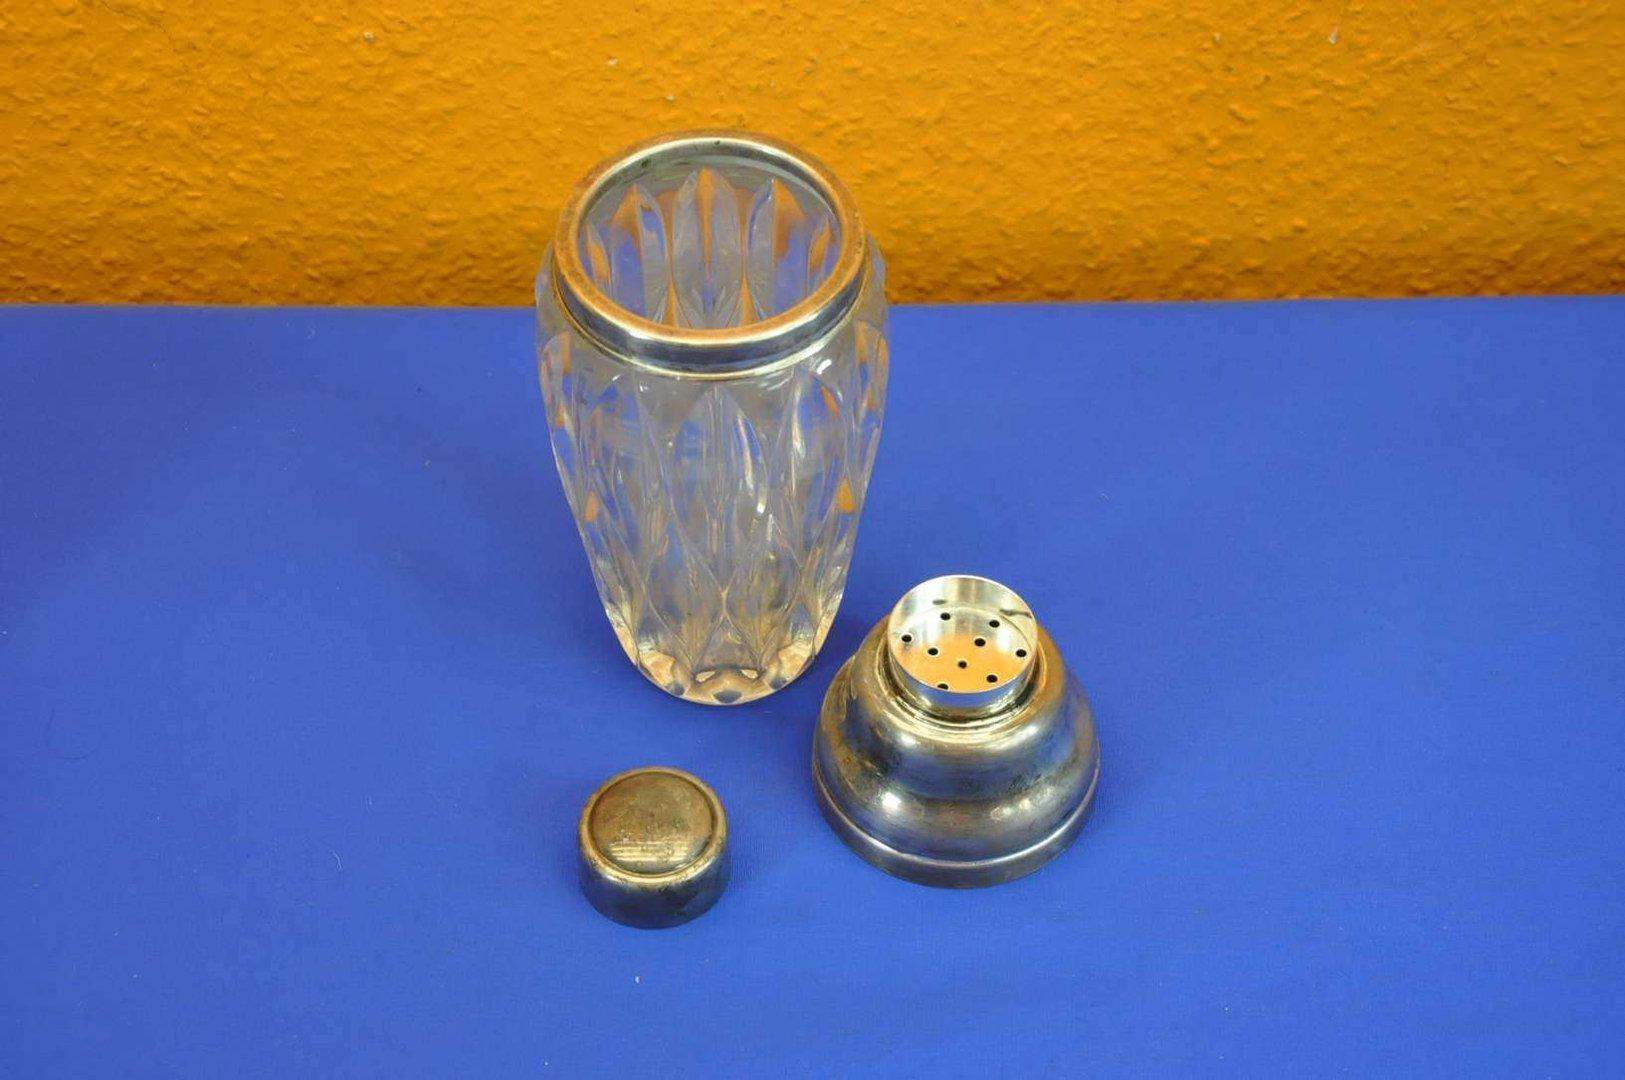 60er jahre kristallglas shaker versilberter ausguss kusera. Black Bedroom Furniture Sets. Home Design Ideas